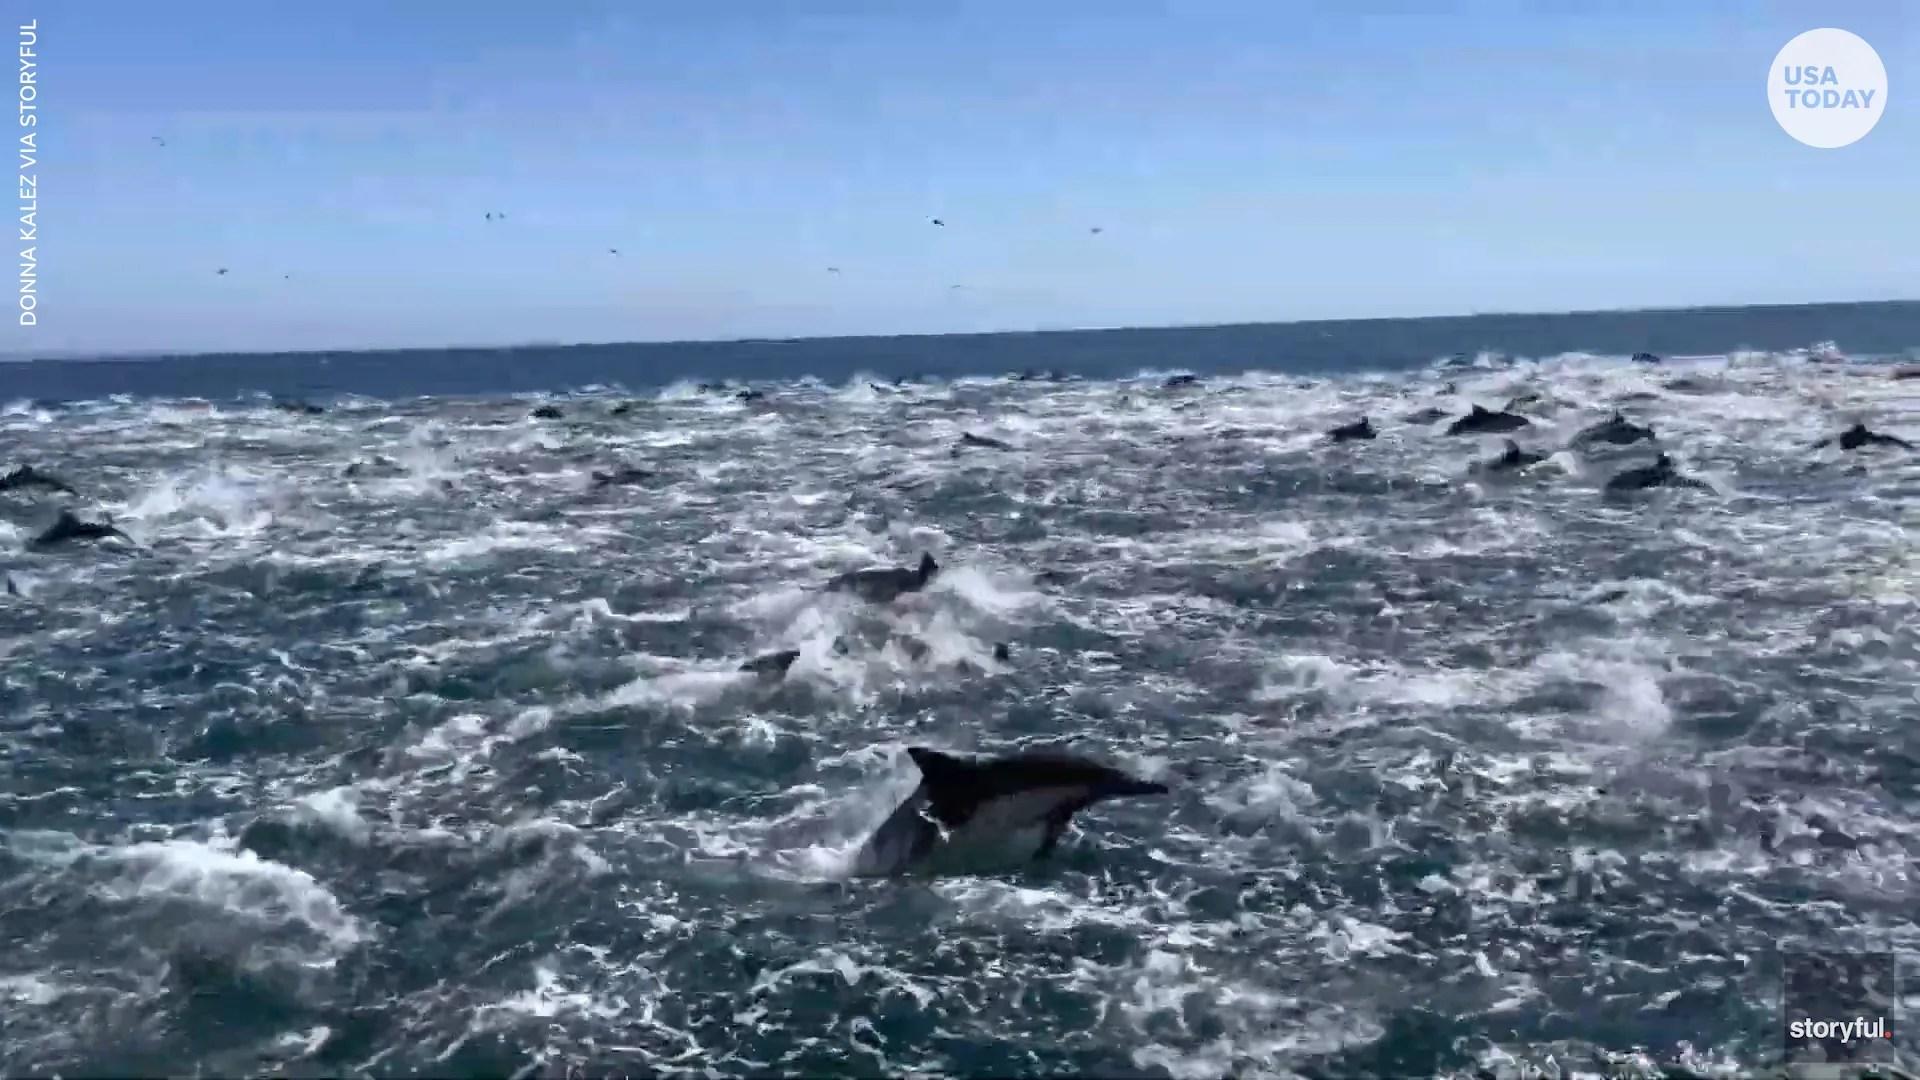 Dolphin 'super pod' races off California coast